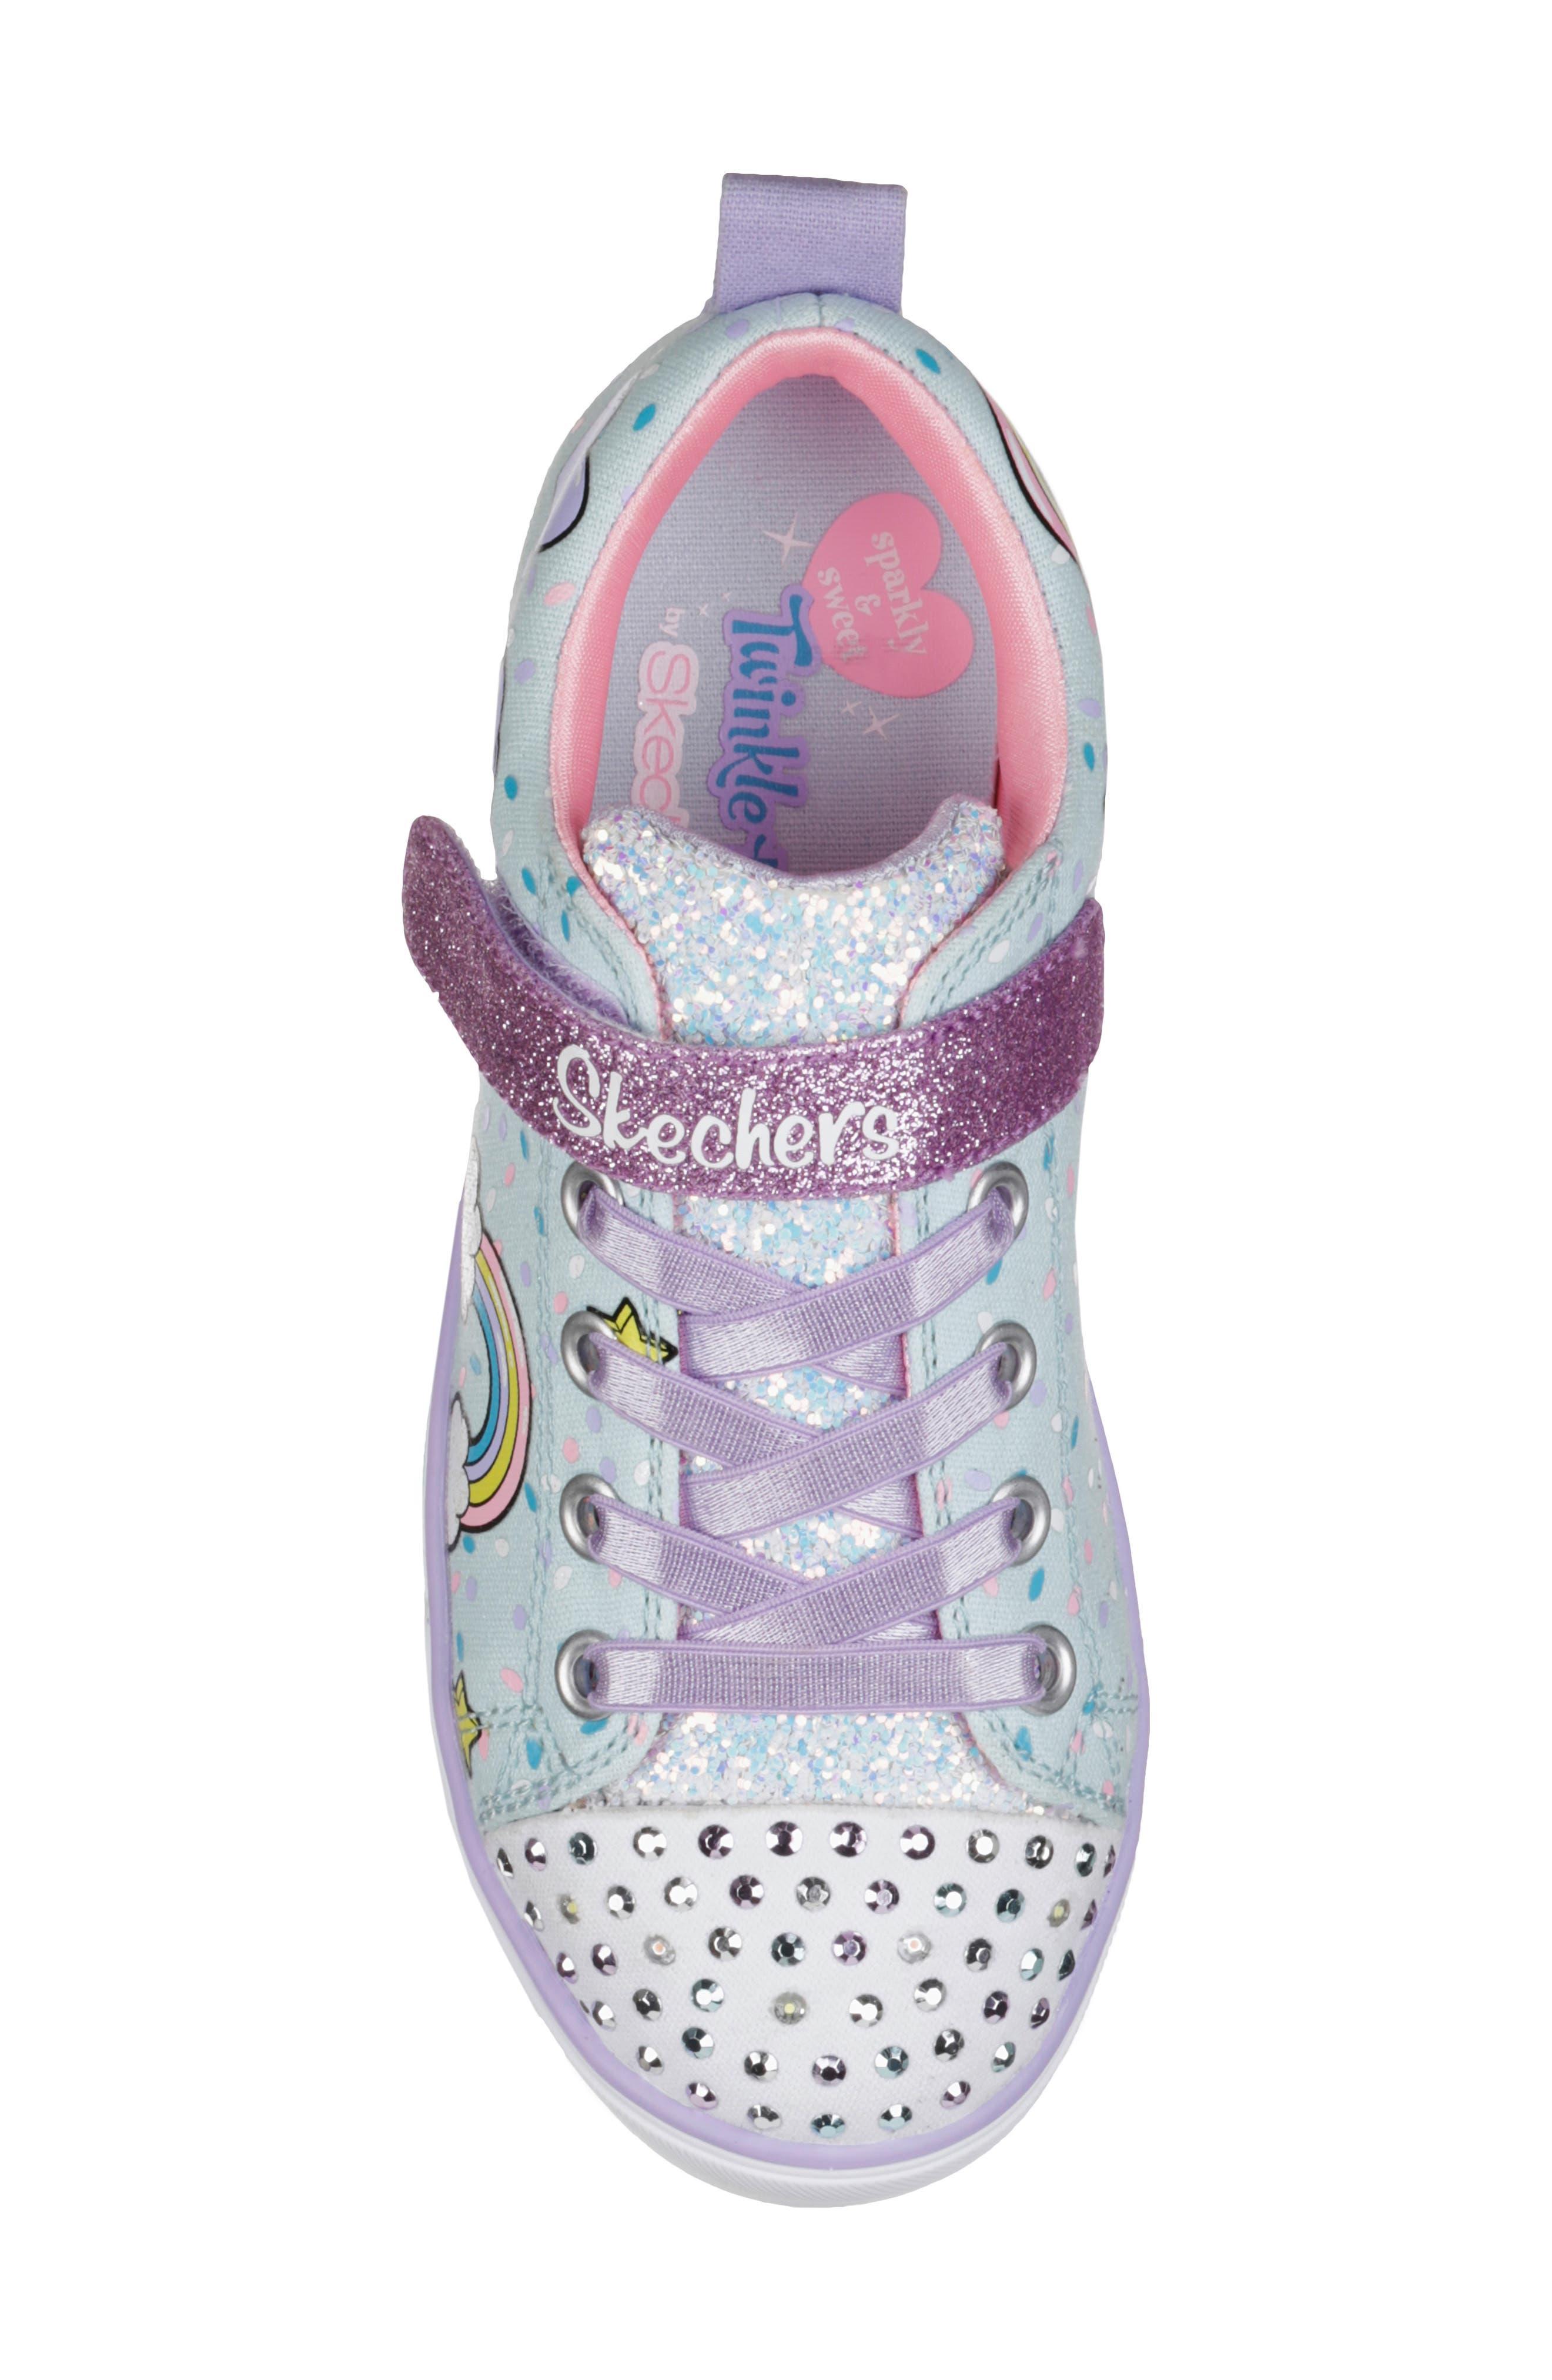 Twinkle Toes Unicorn Light-Up Sneaker,                             Alternate thumbnail 5, color,                             LIGHT BLUE/ MULTI